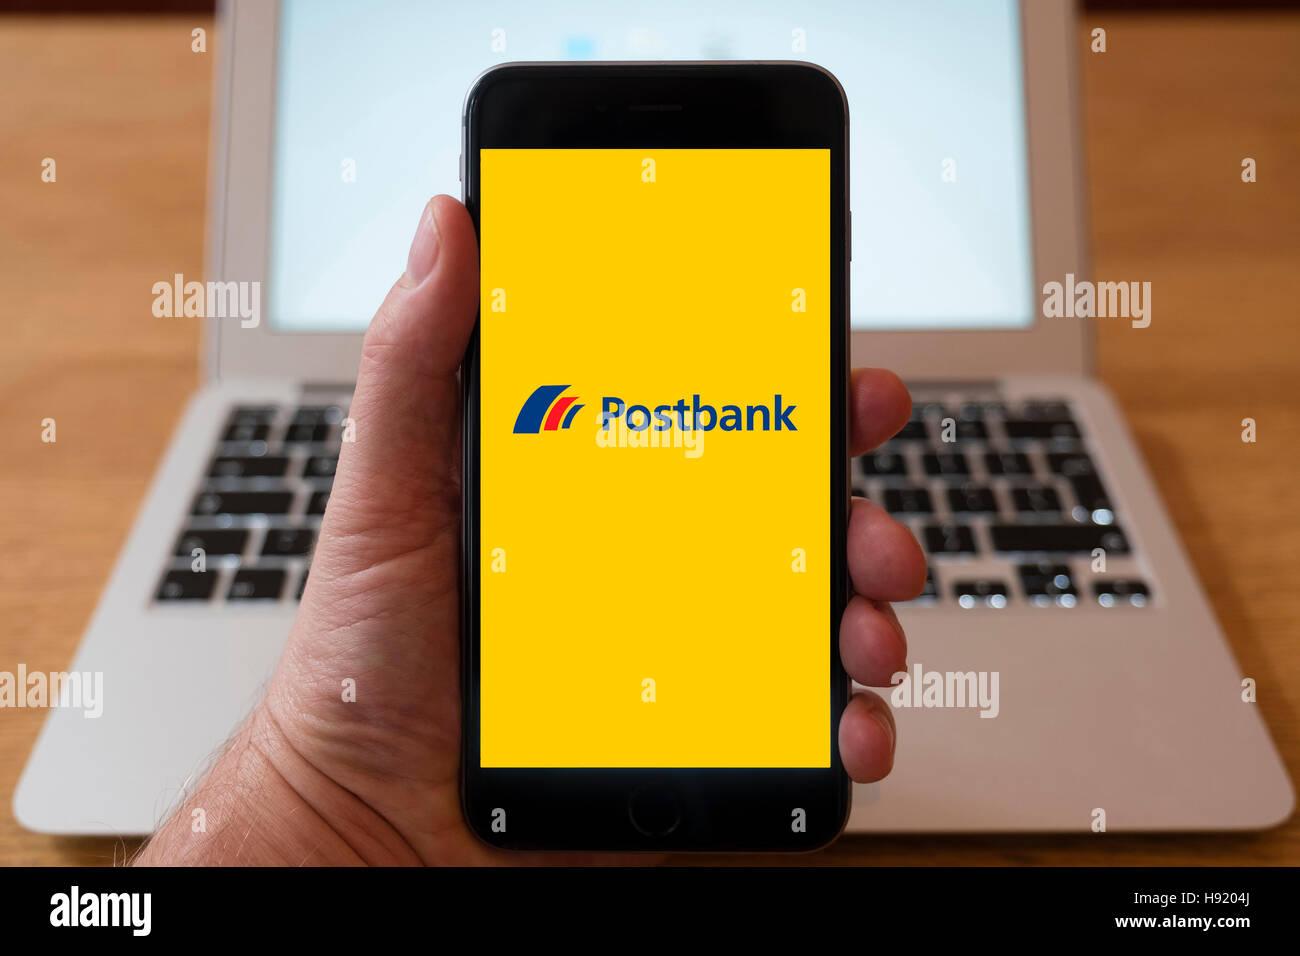 Using iPhone smart phone to display website logo of Postbank, German retail bank - Stock Image